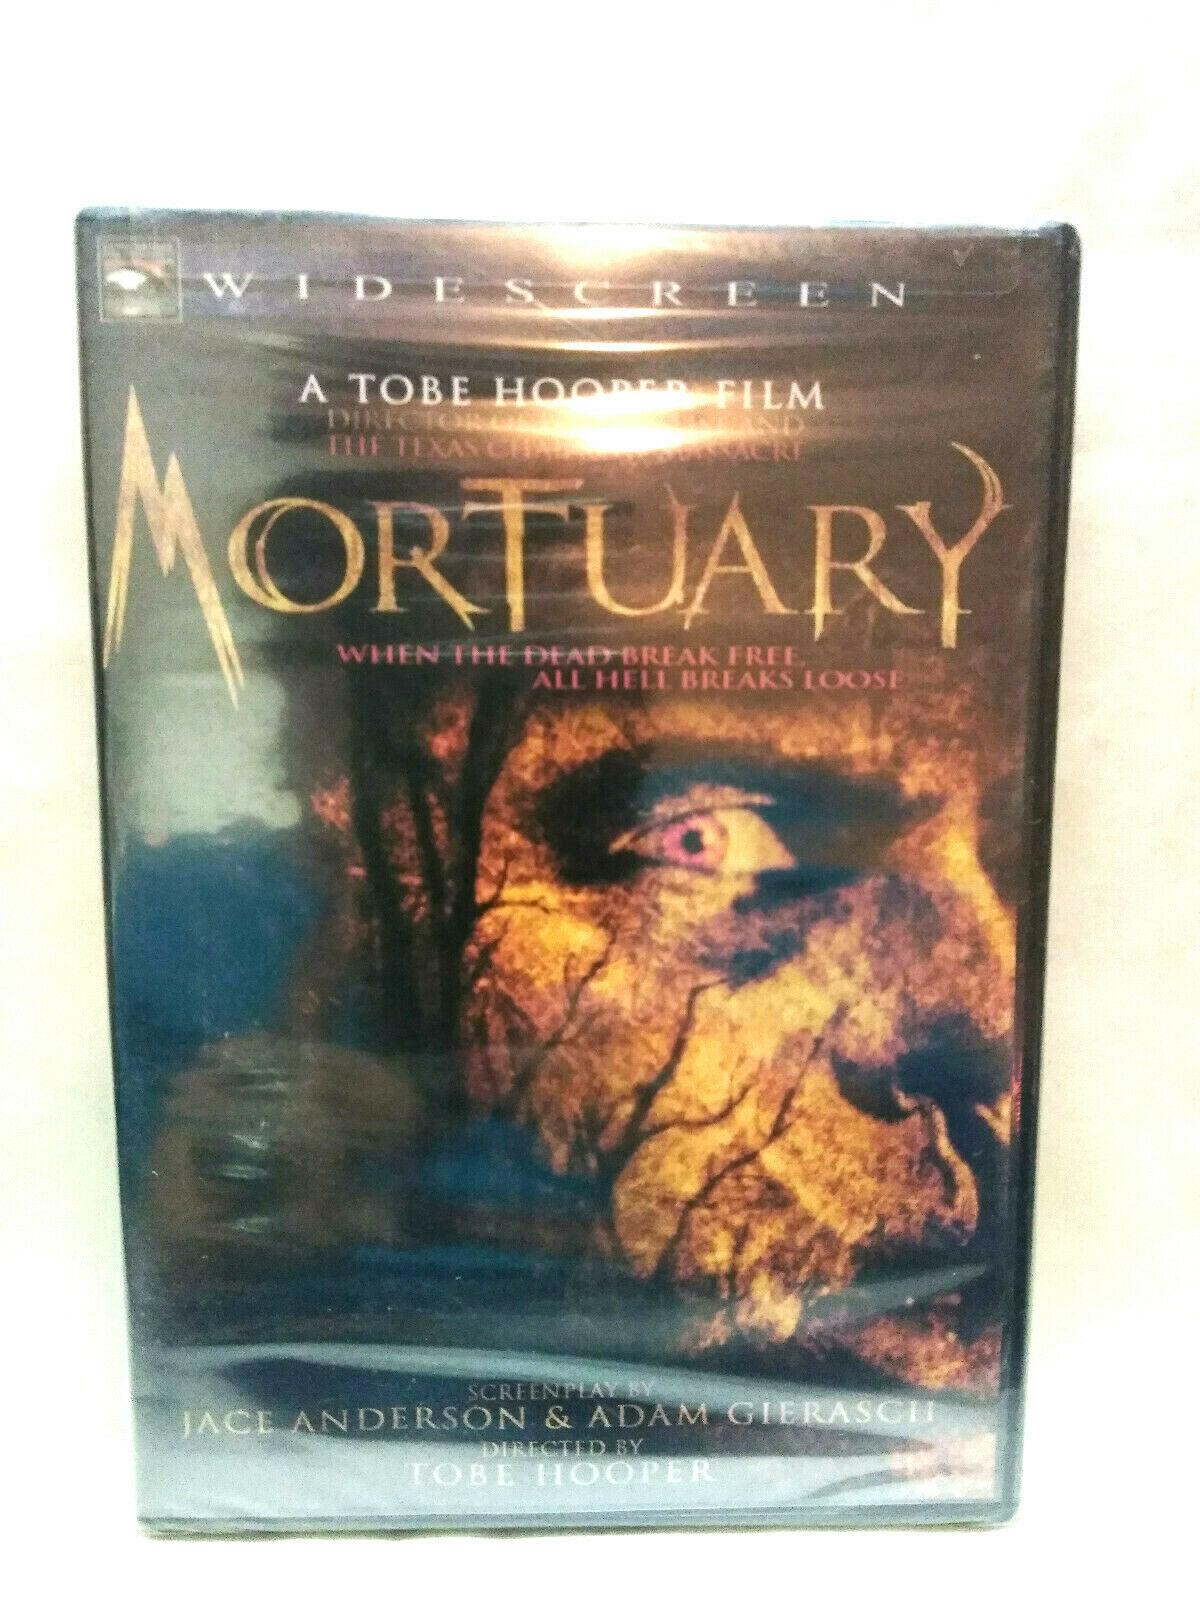 Mortuary (DVD, 2006) New Sealed-Denise Crosby, Dan Byrd